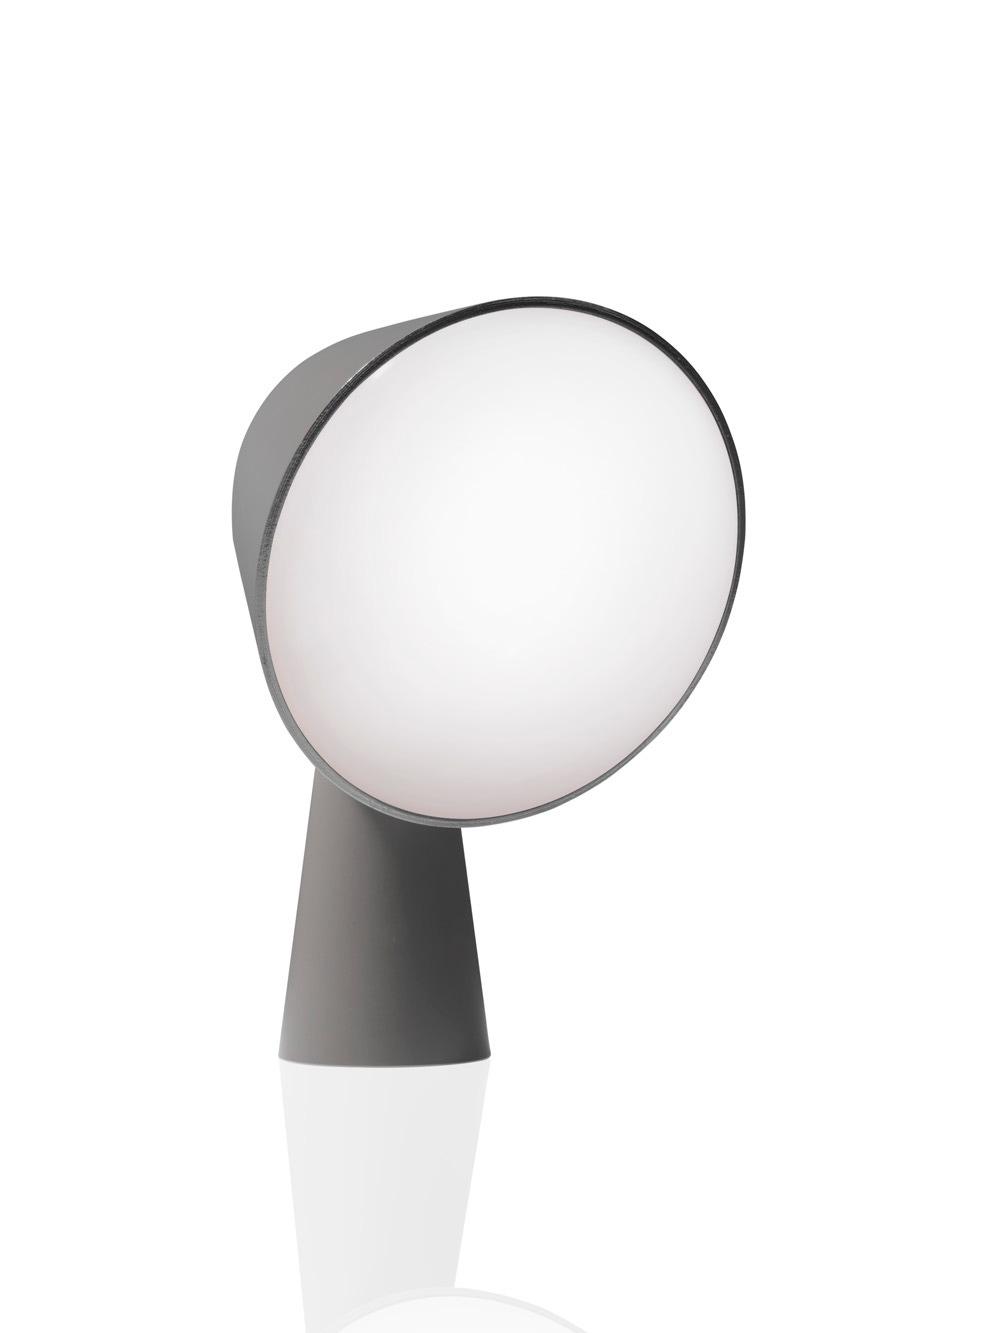 Foscarini binic table lamp gr shop canada - Lamp binic ...